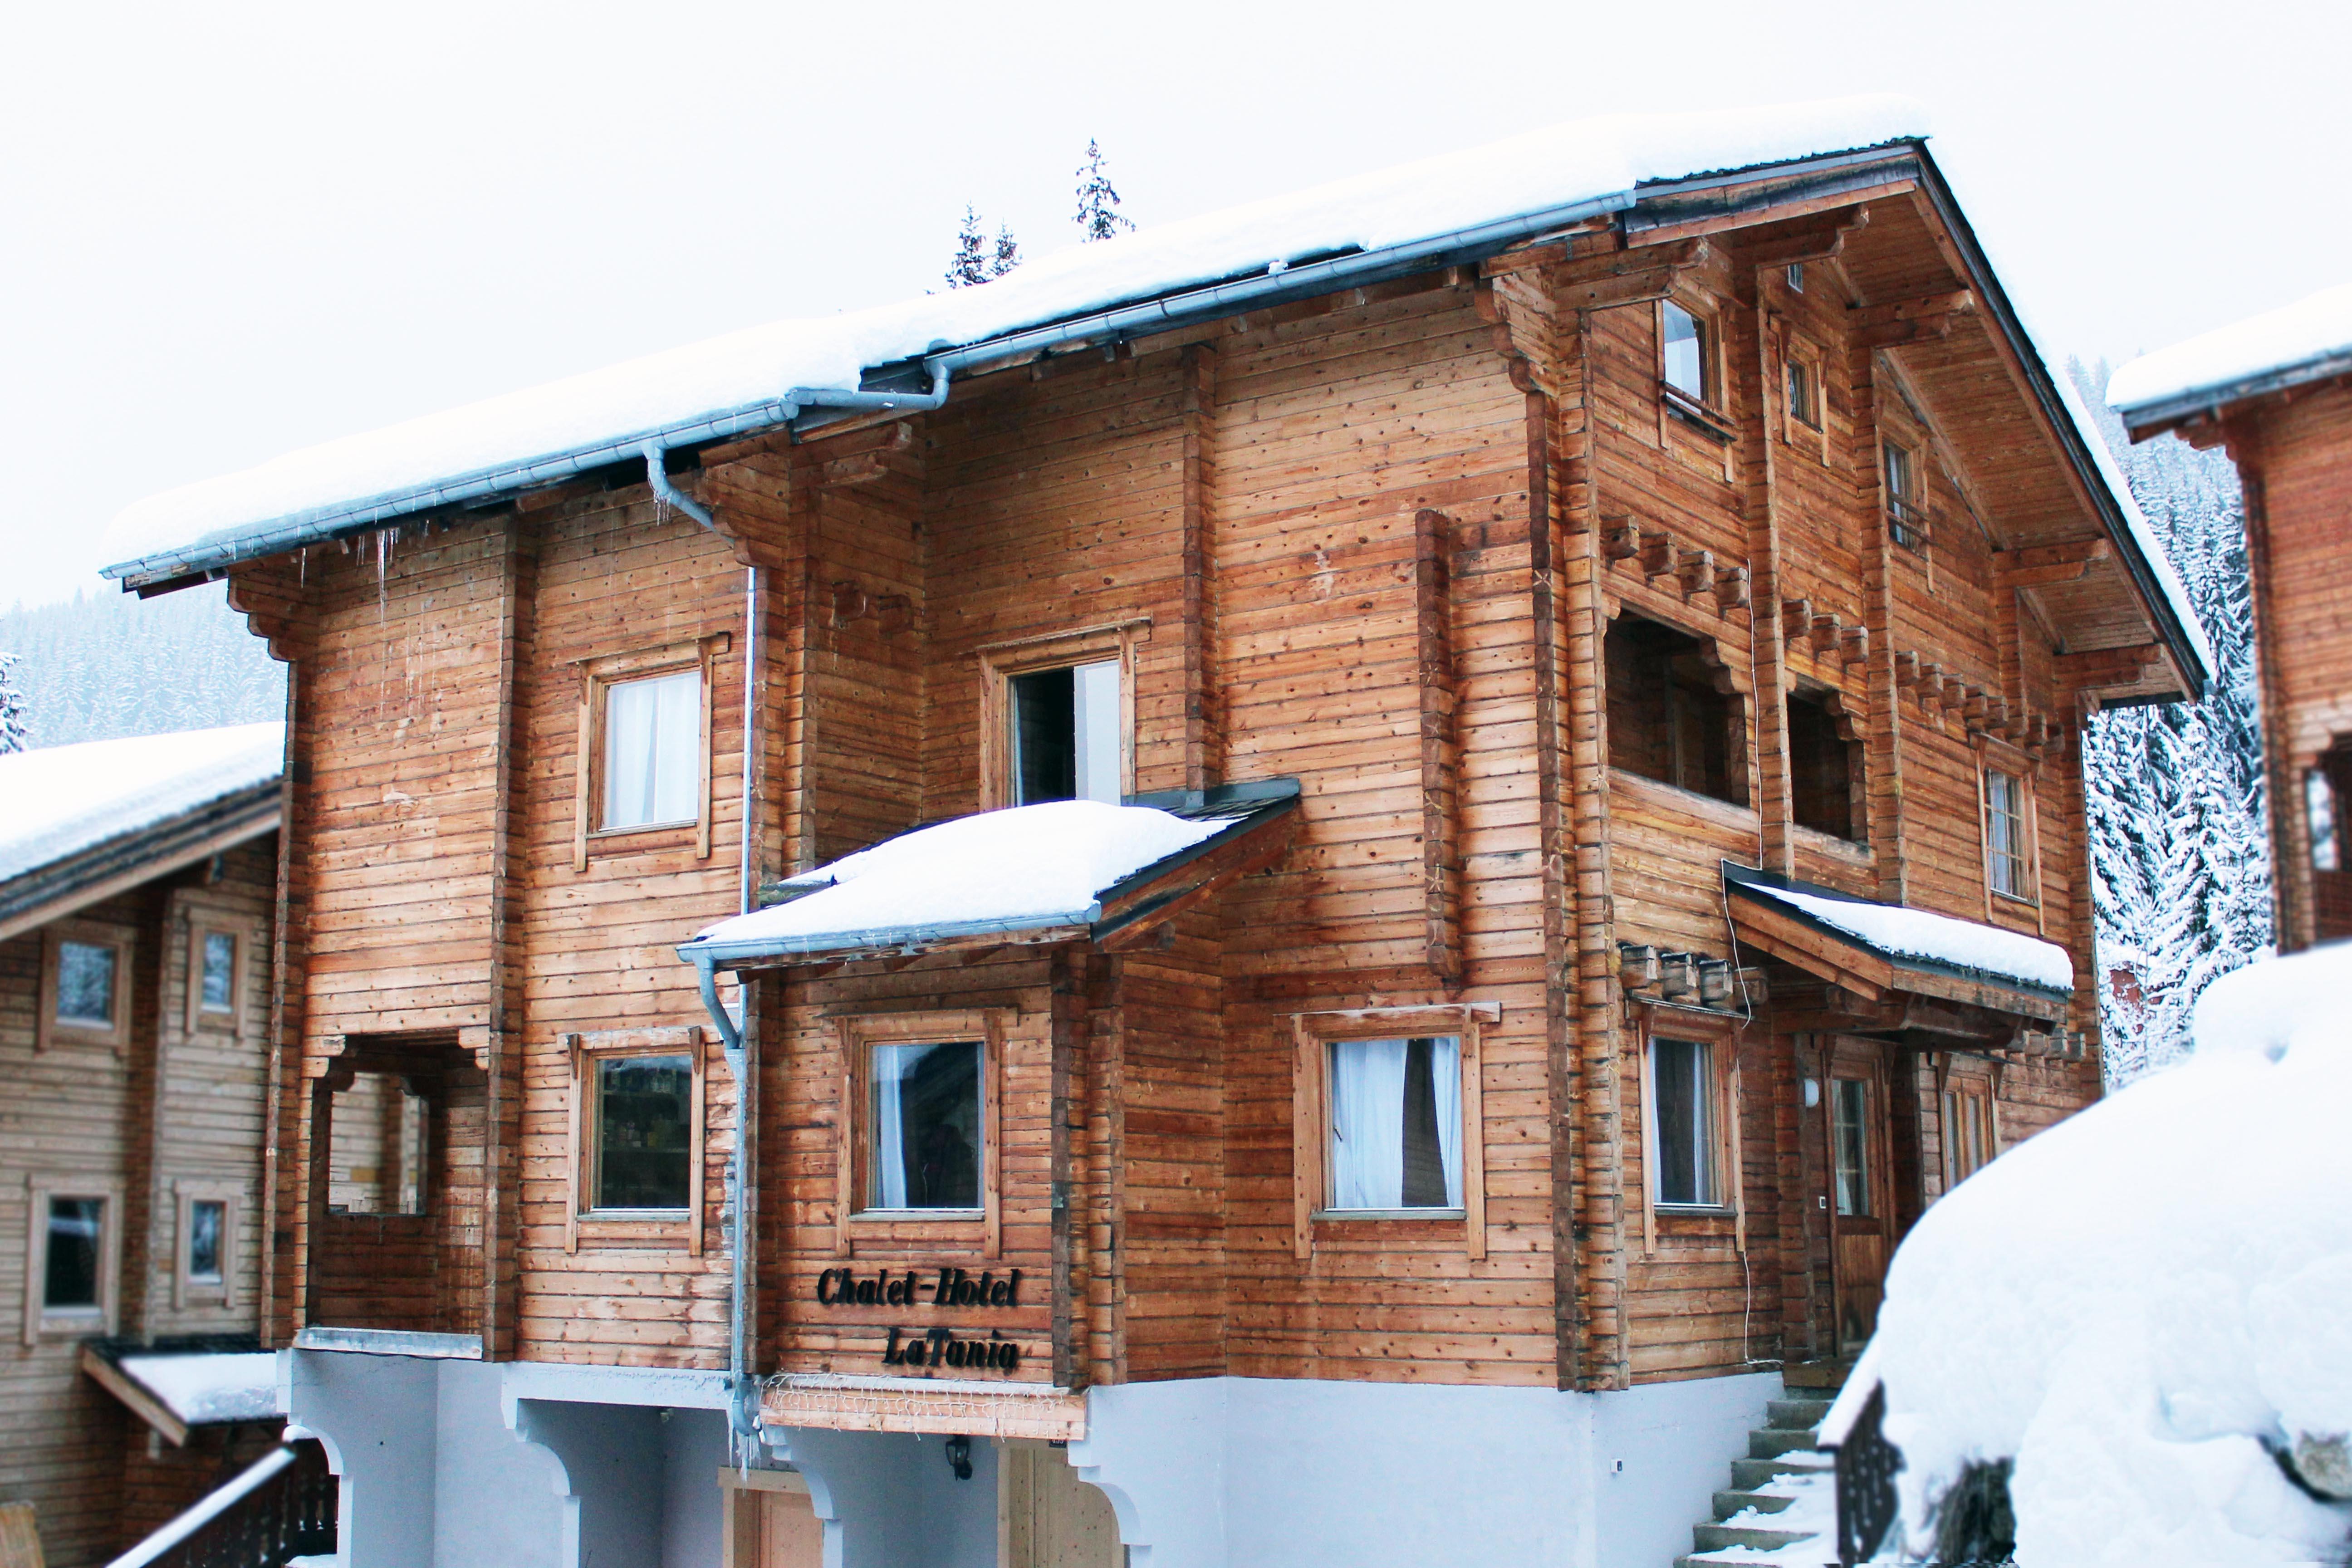 chalet-hotel outside